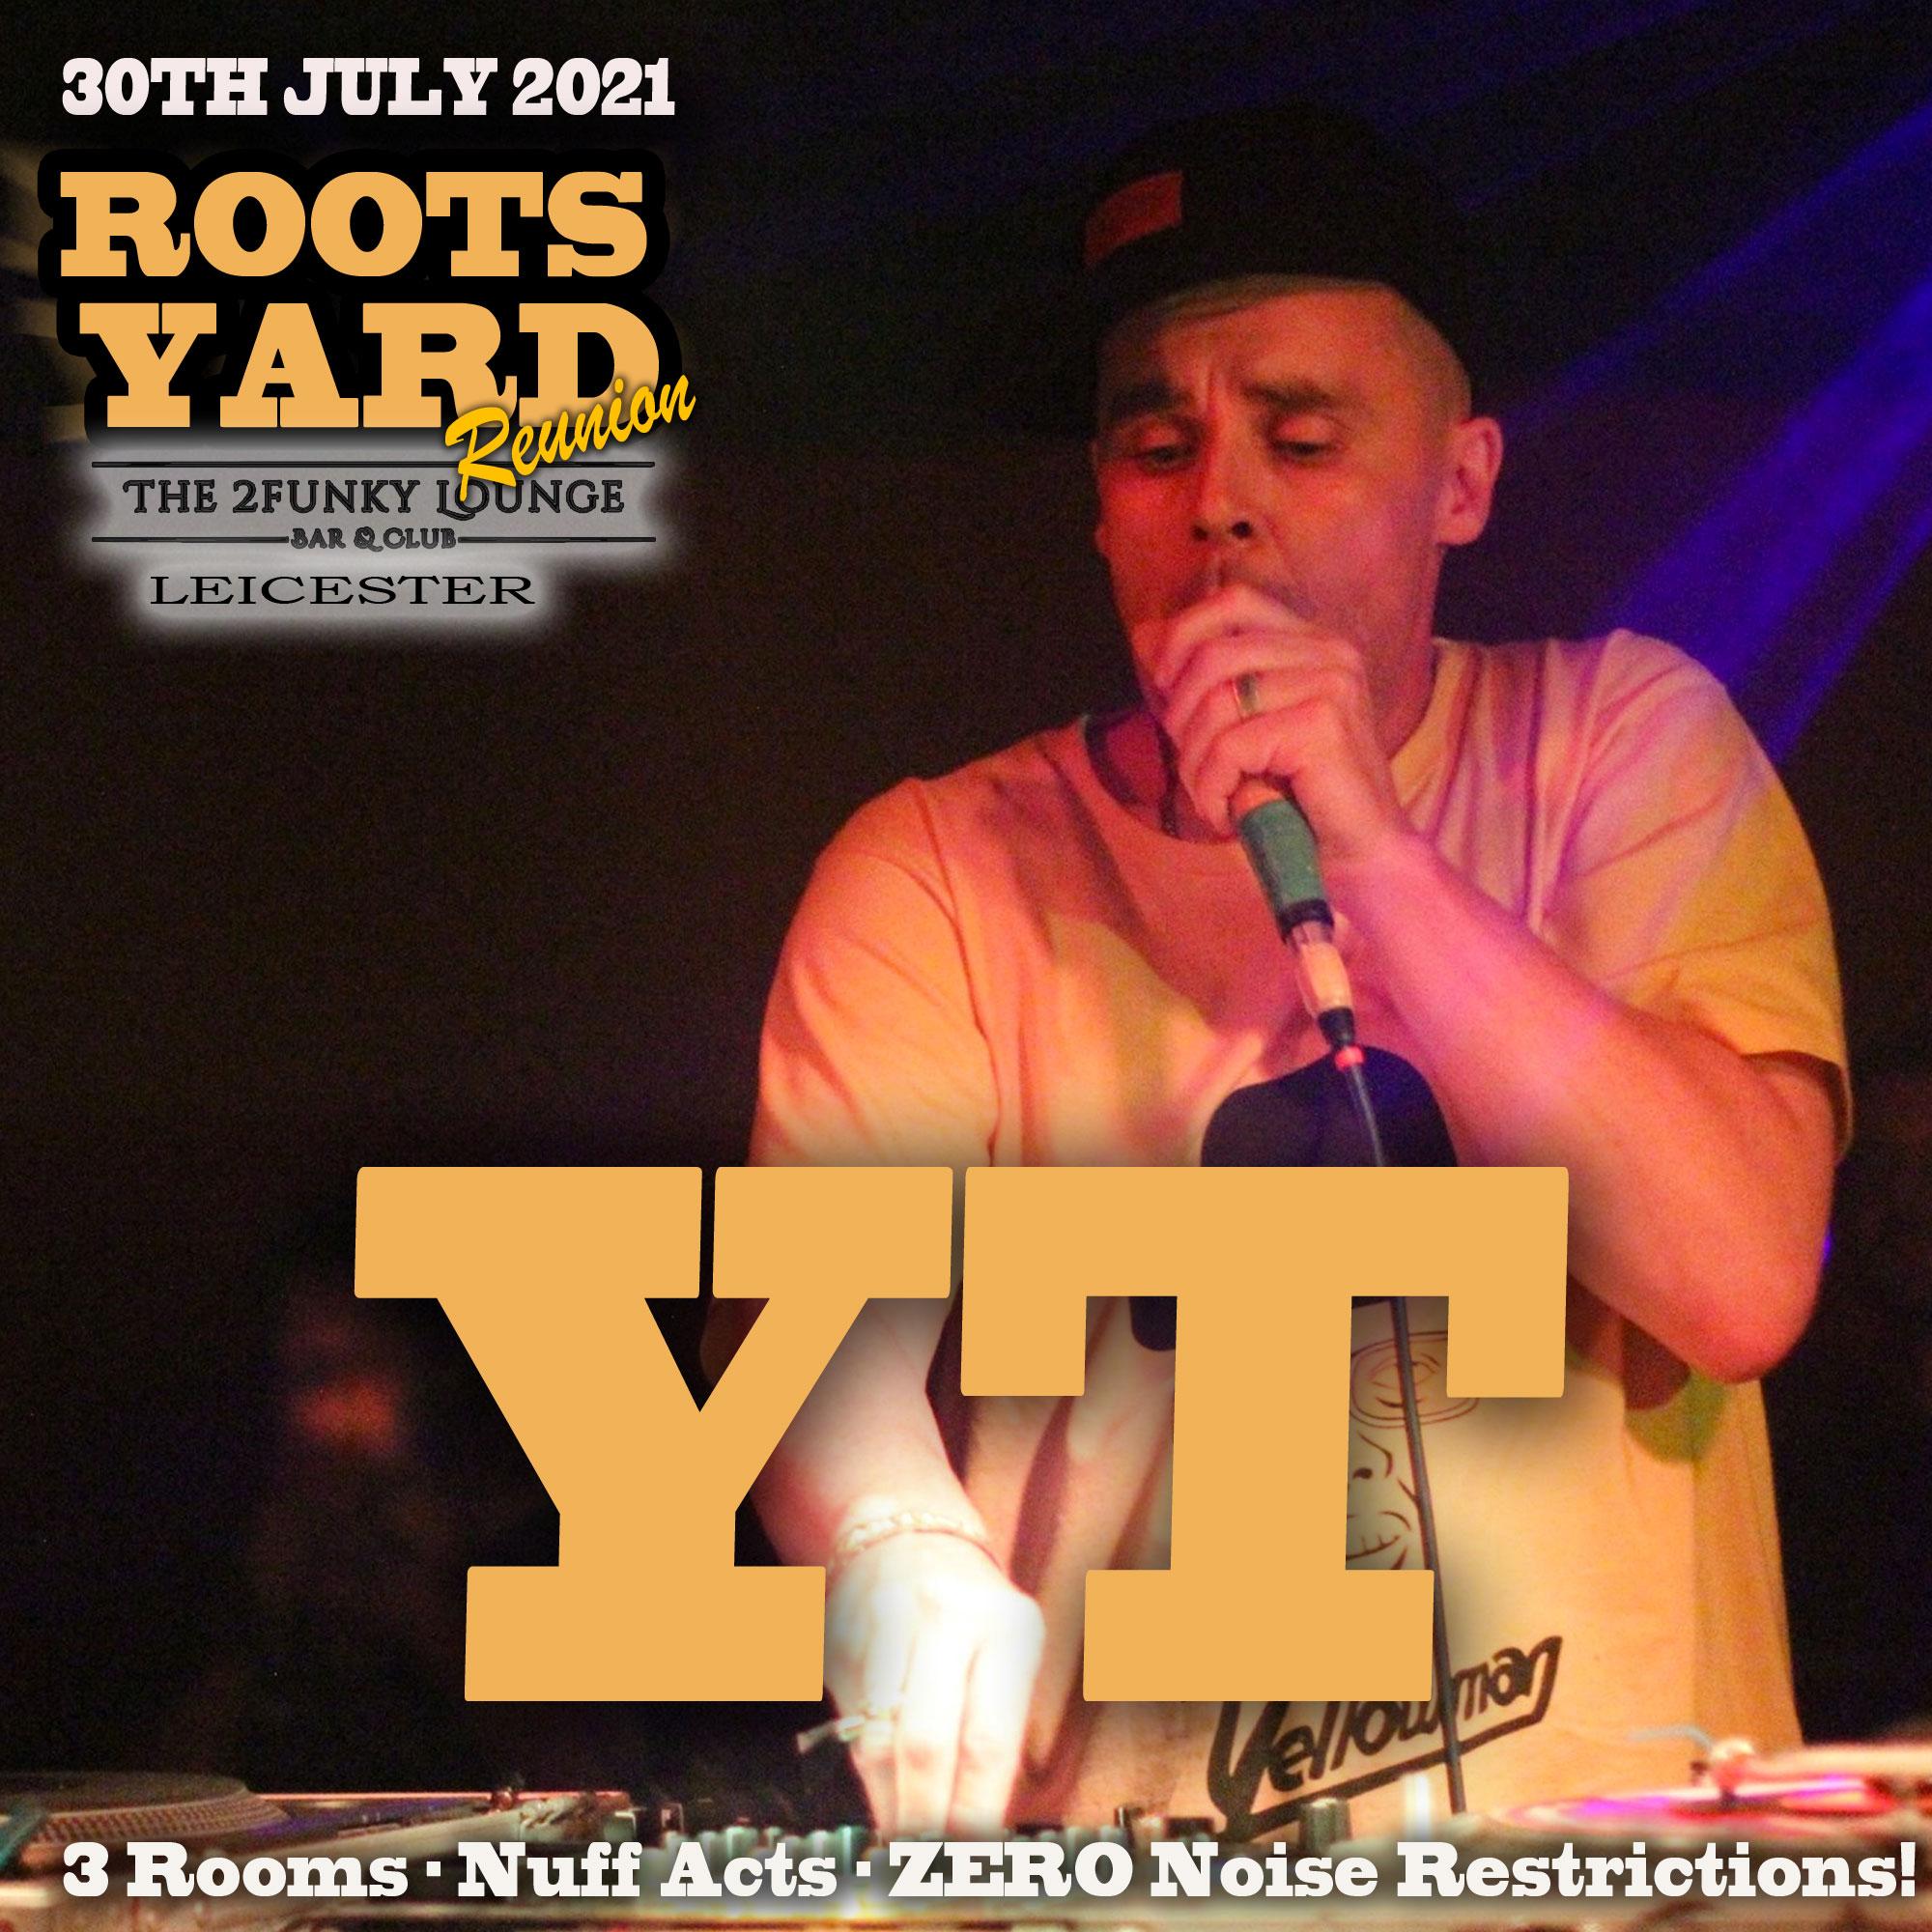 YT---roots-yard-reunion-insta-post